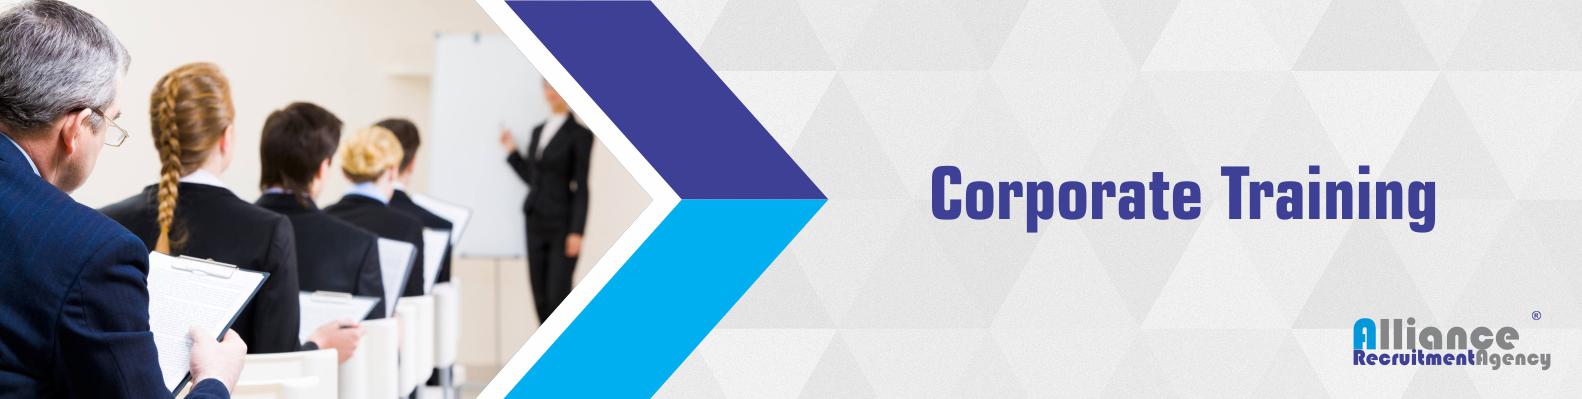 Best Corporate Training Programs - Corporate Training in India